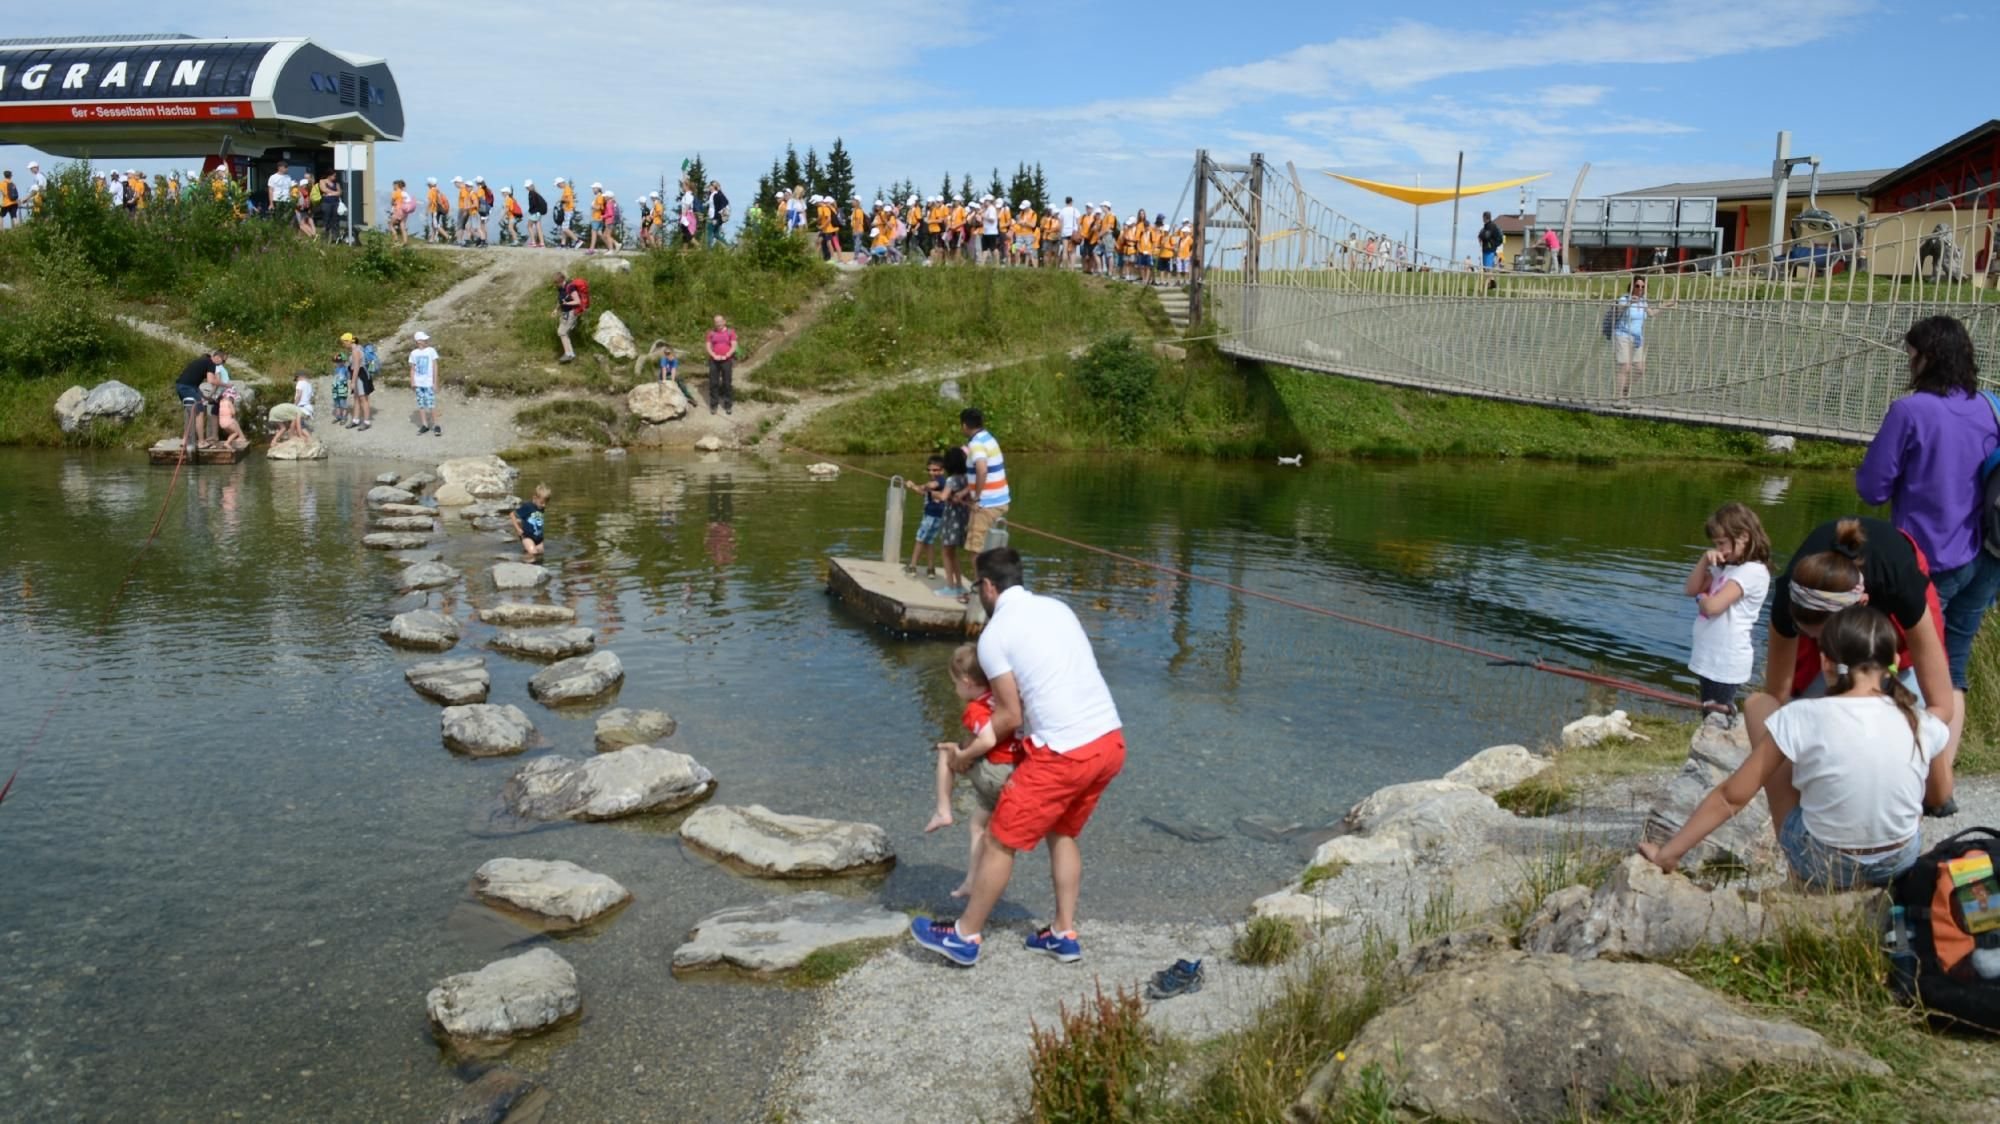 Wagrain Grafenberg (childrens fun park) - Wagrain, Austria